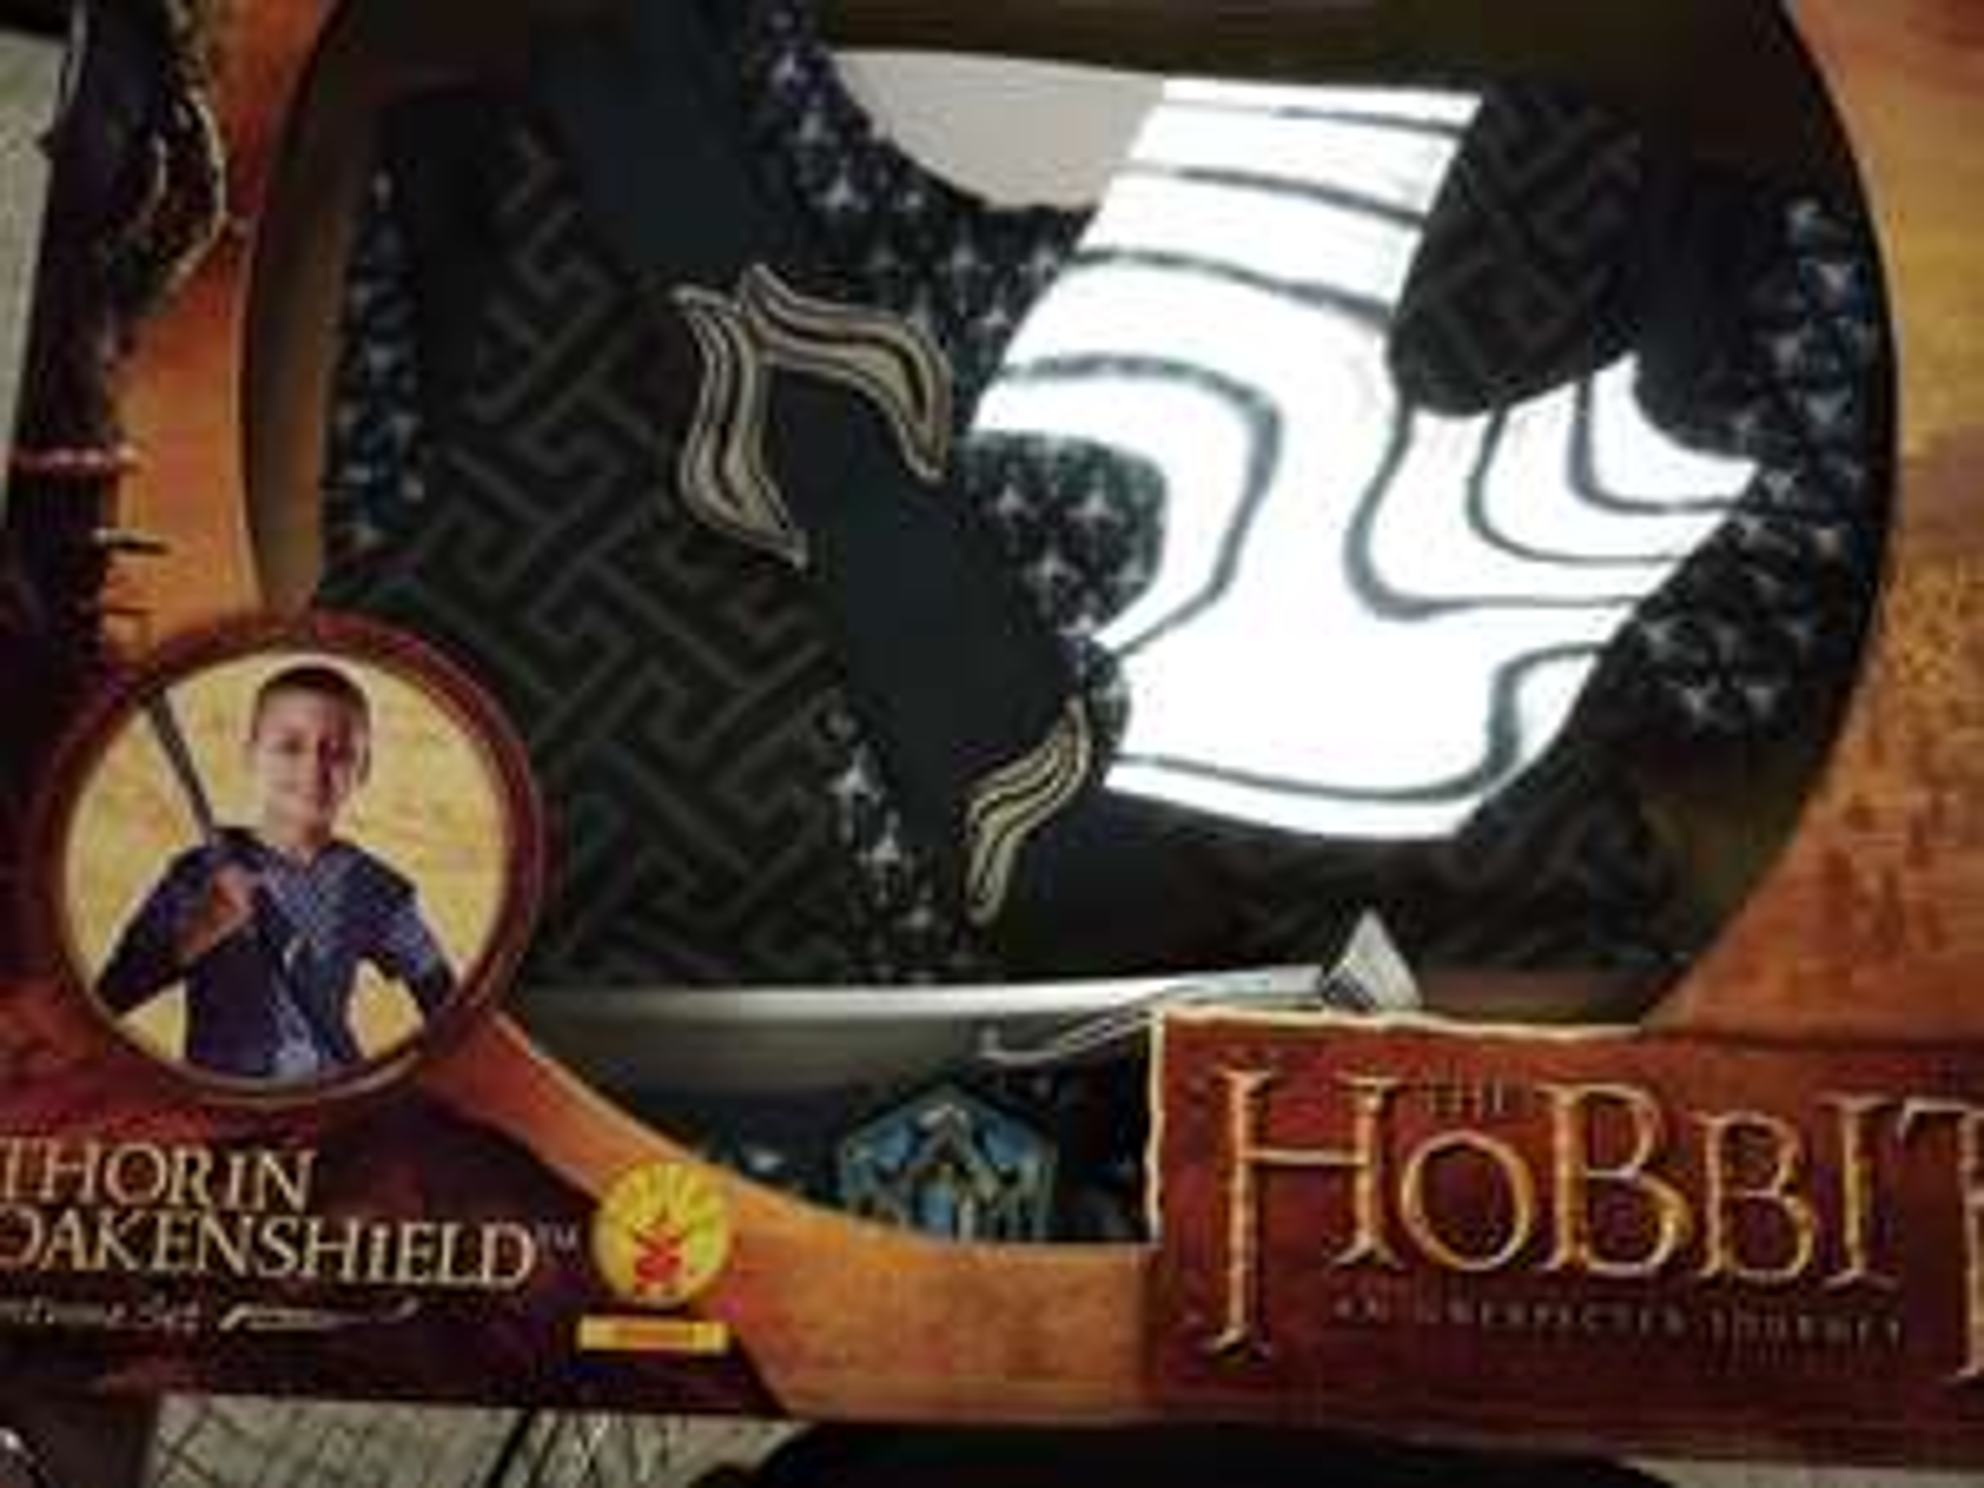 Thorin Oakenshield children's costume £1.49 instore @ Home Bargains (Eccles)